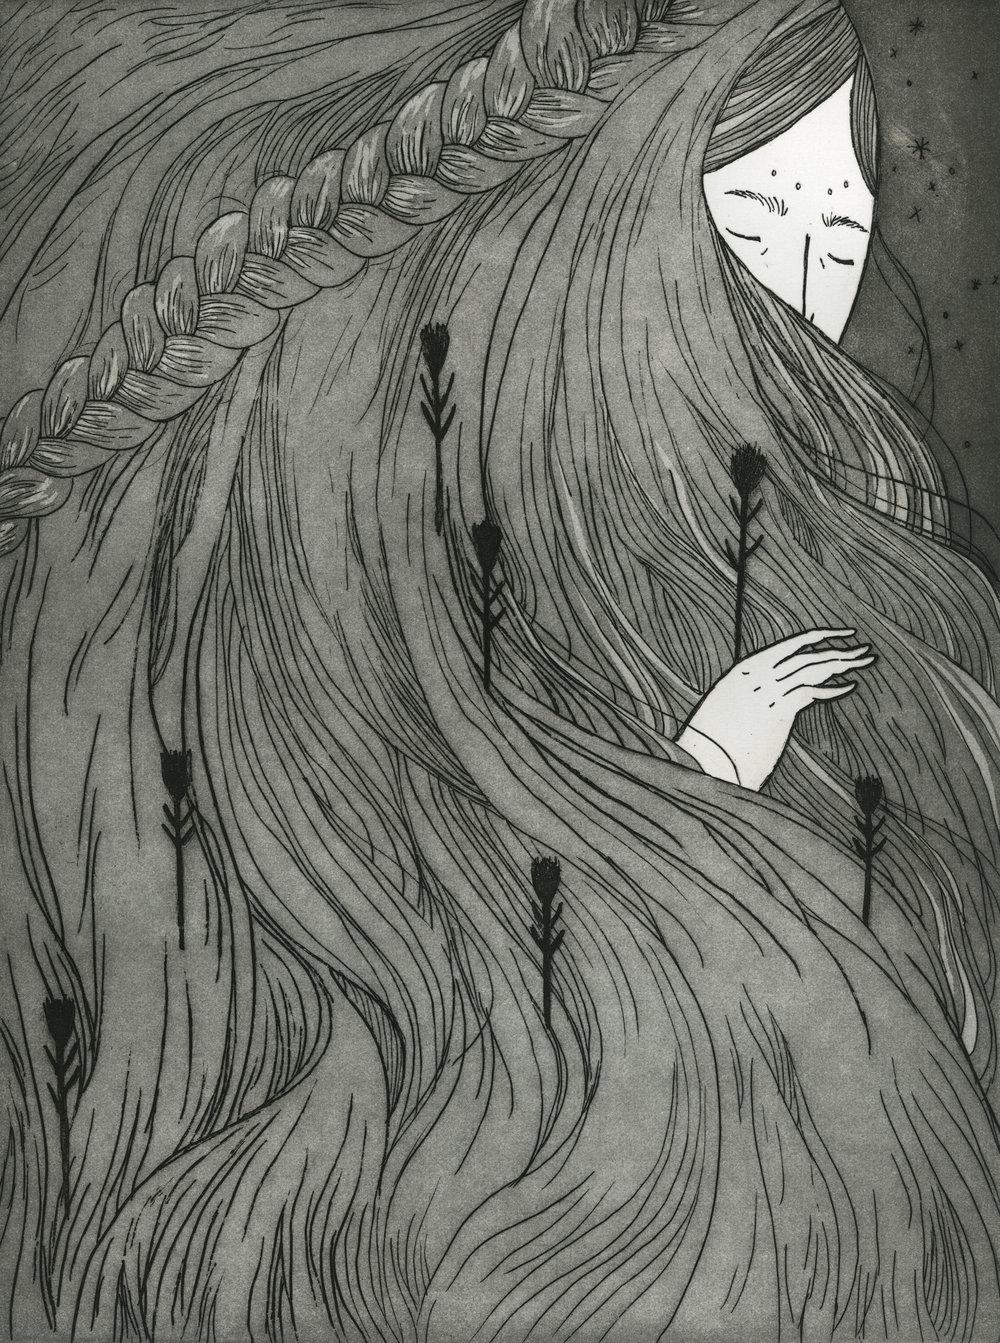 Intaglio drawing